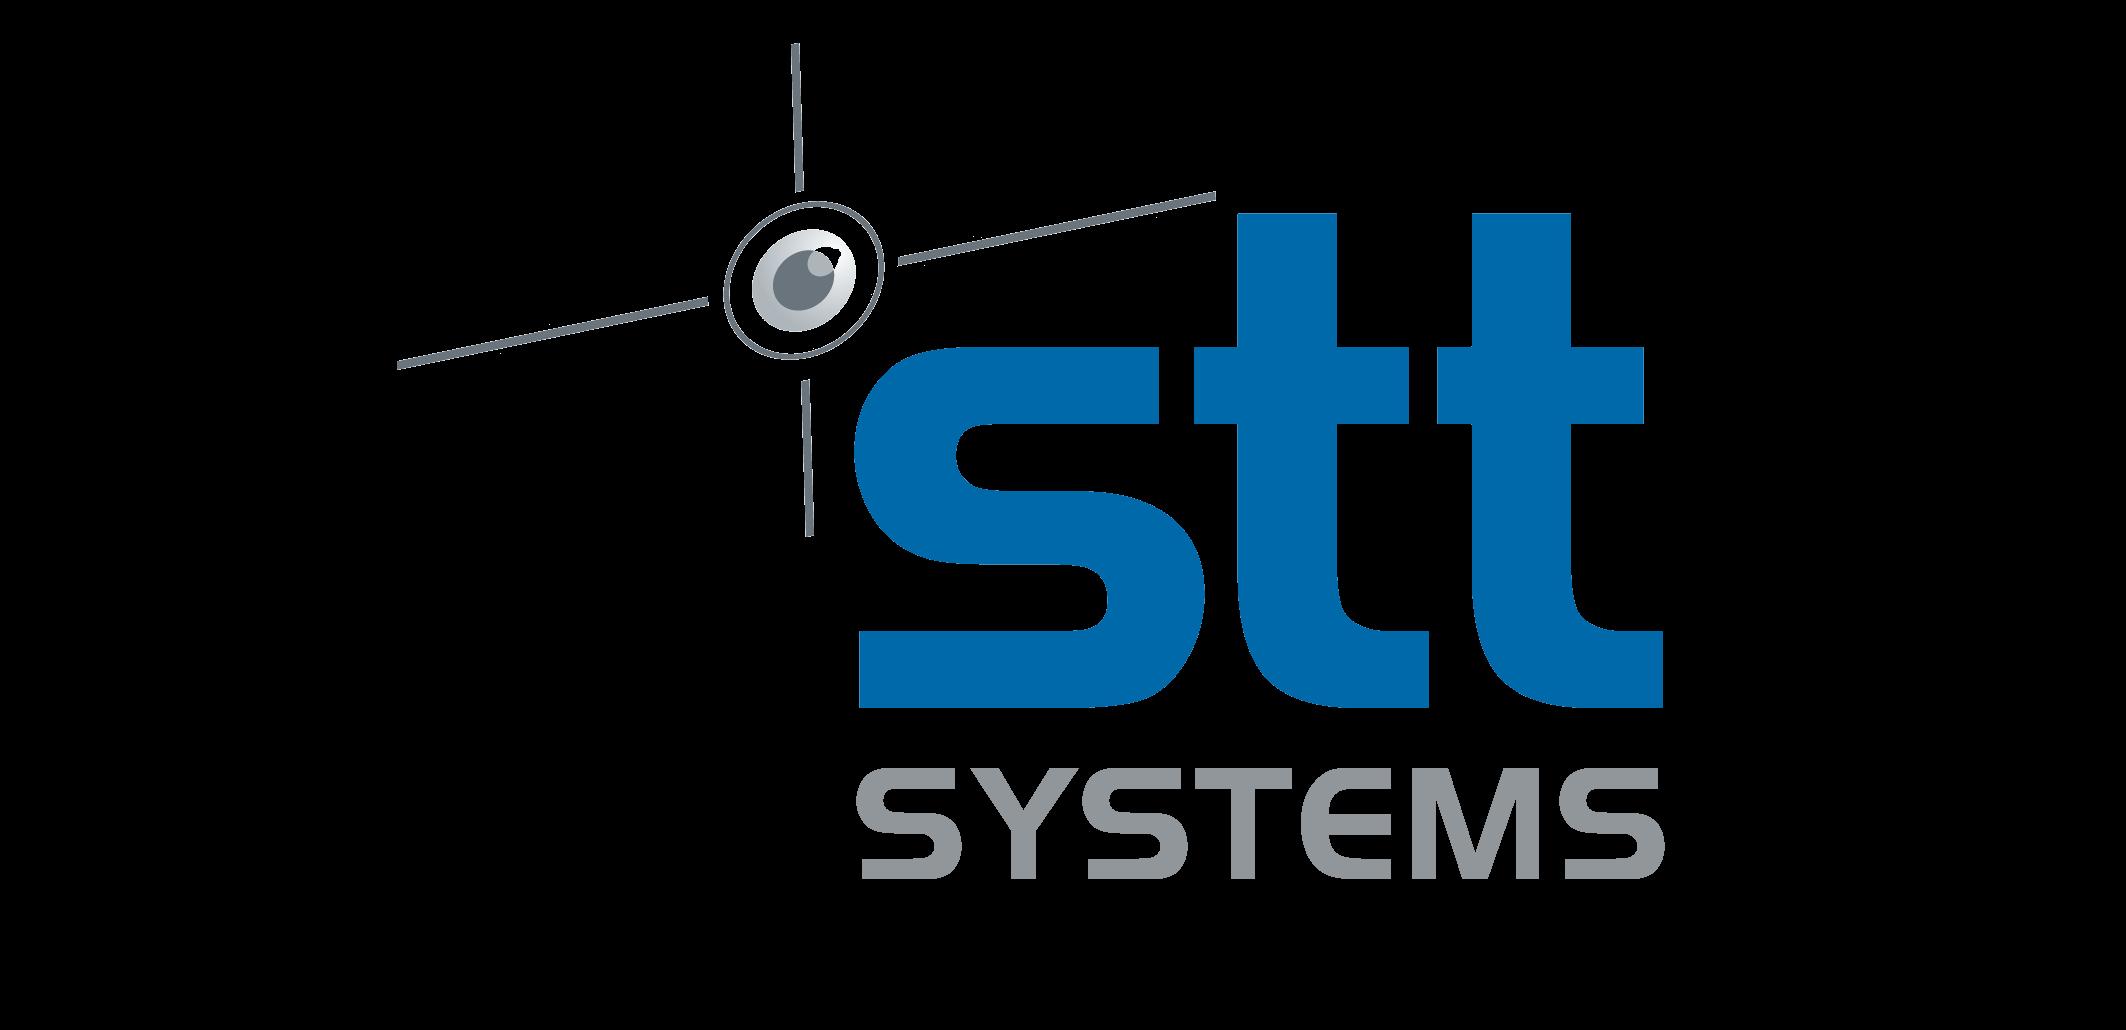 STT SYSTEMS